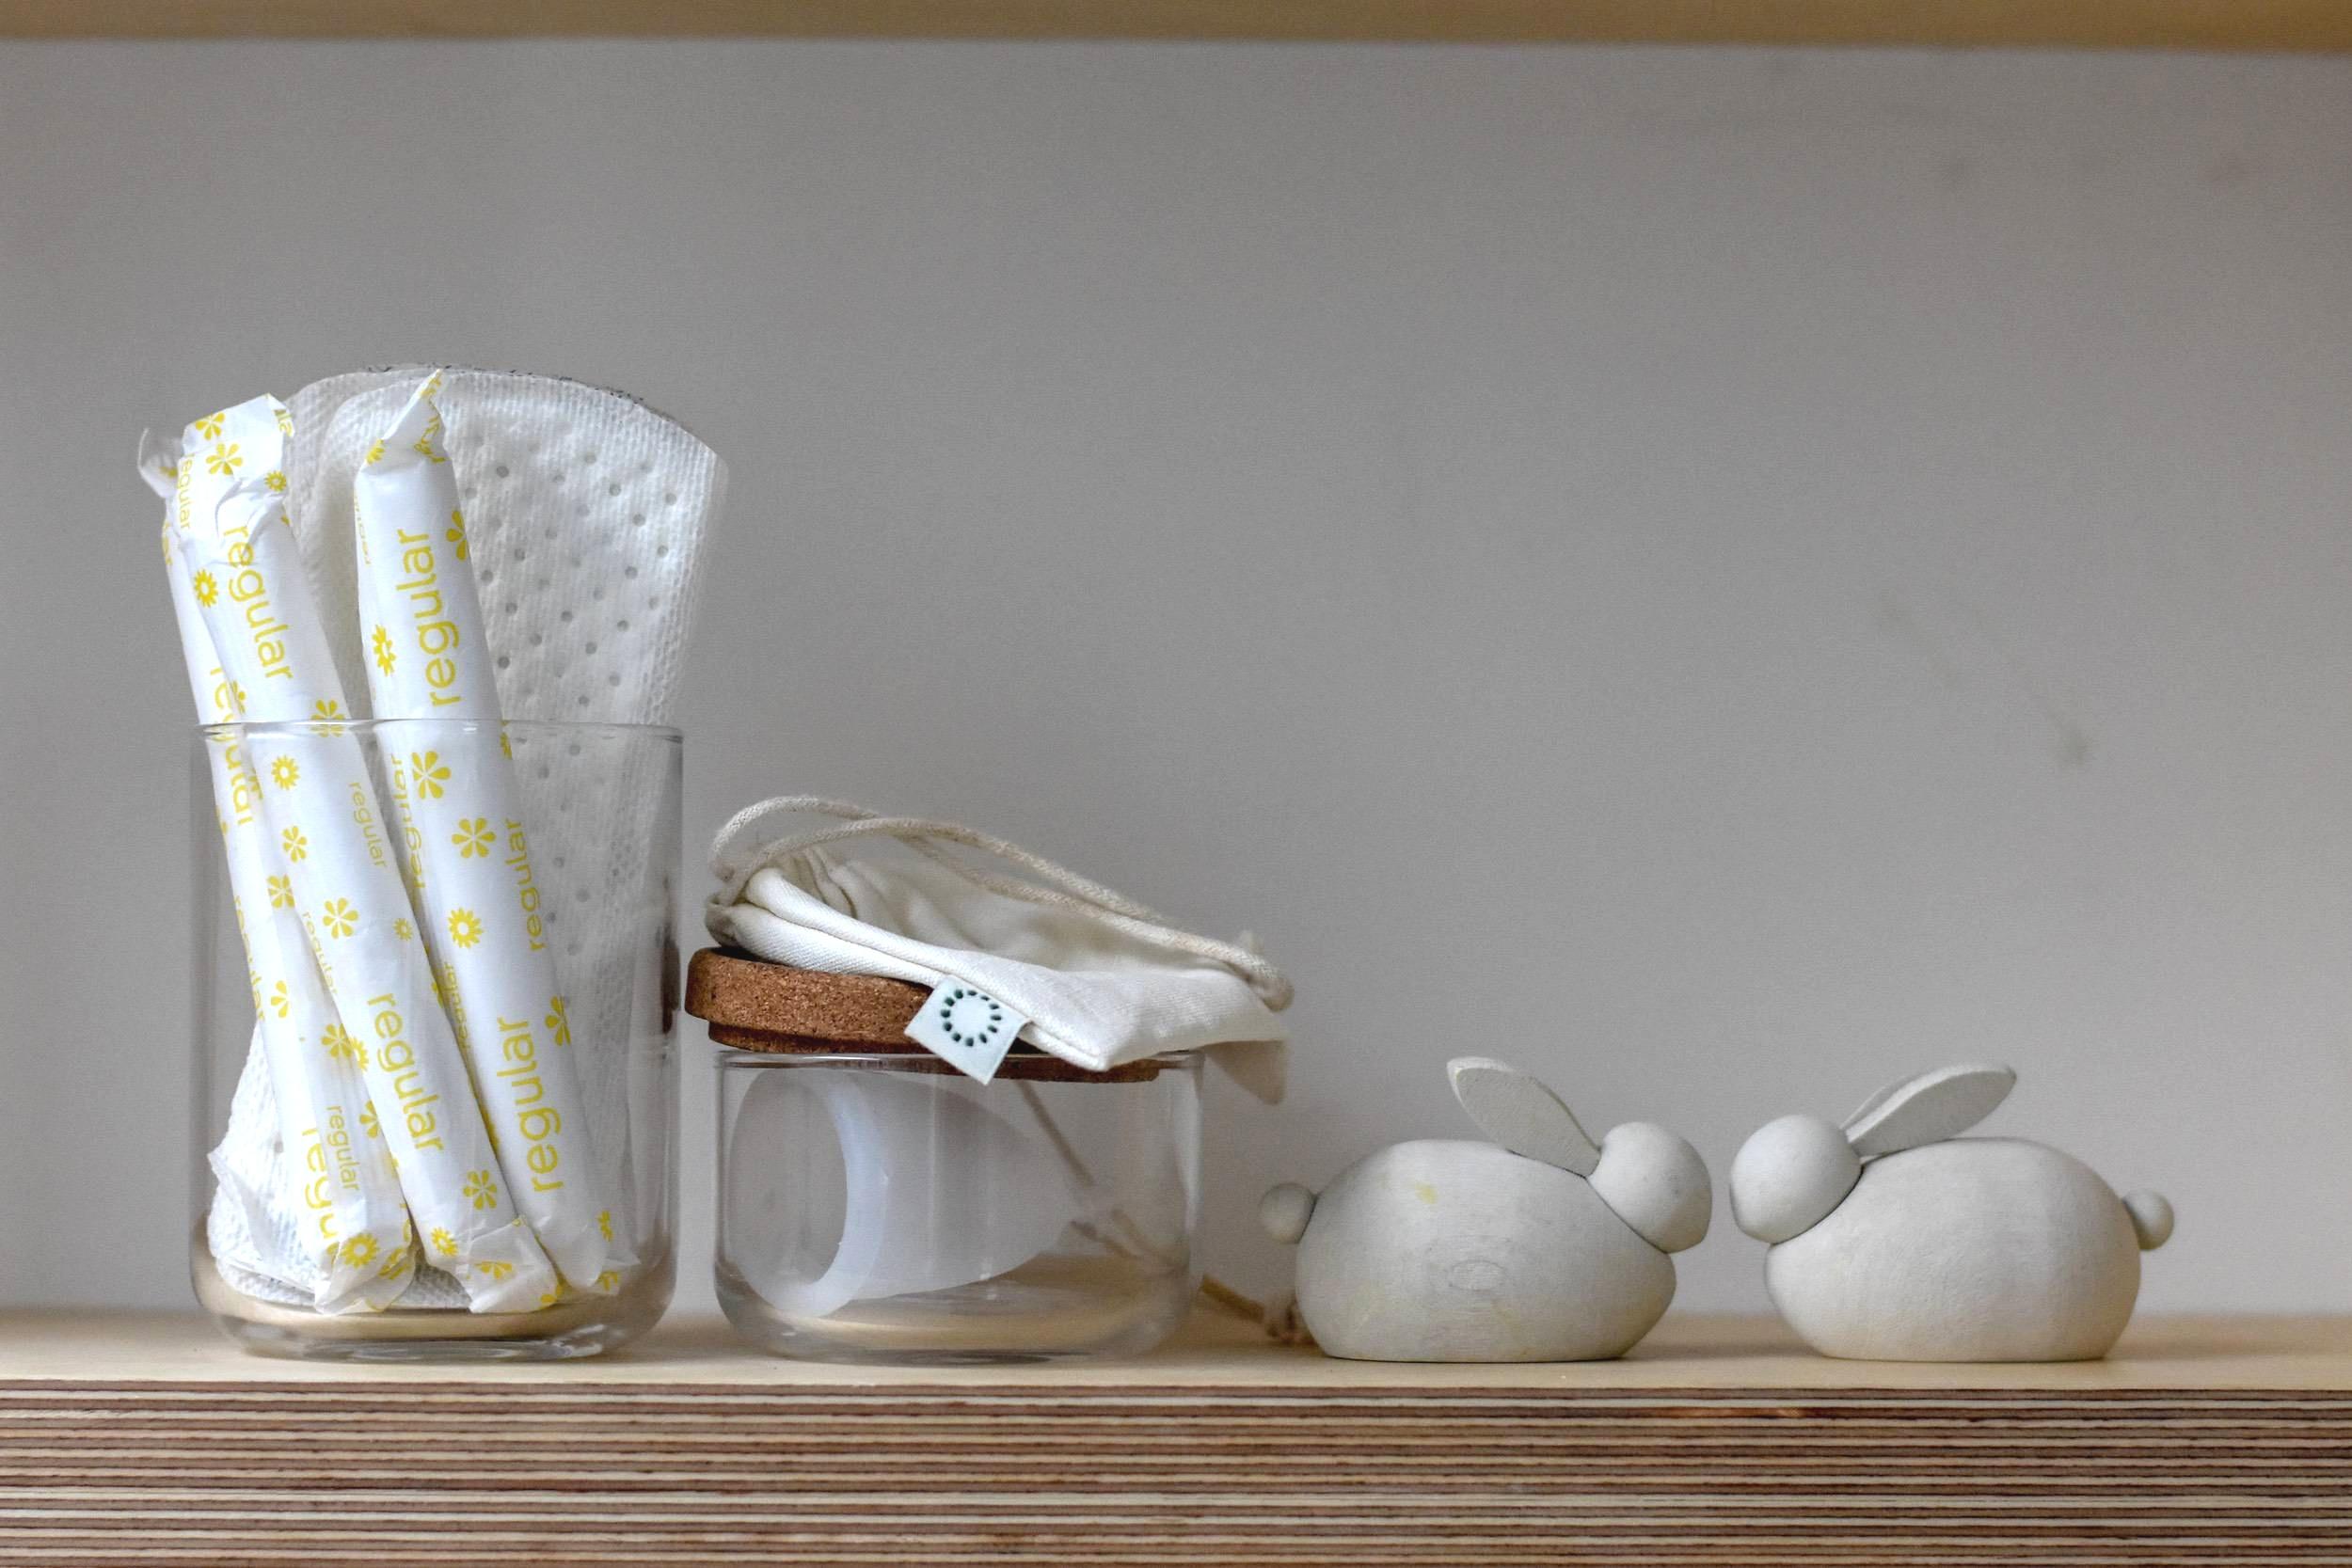 plastic-free-menstrual-products